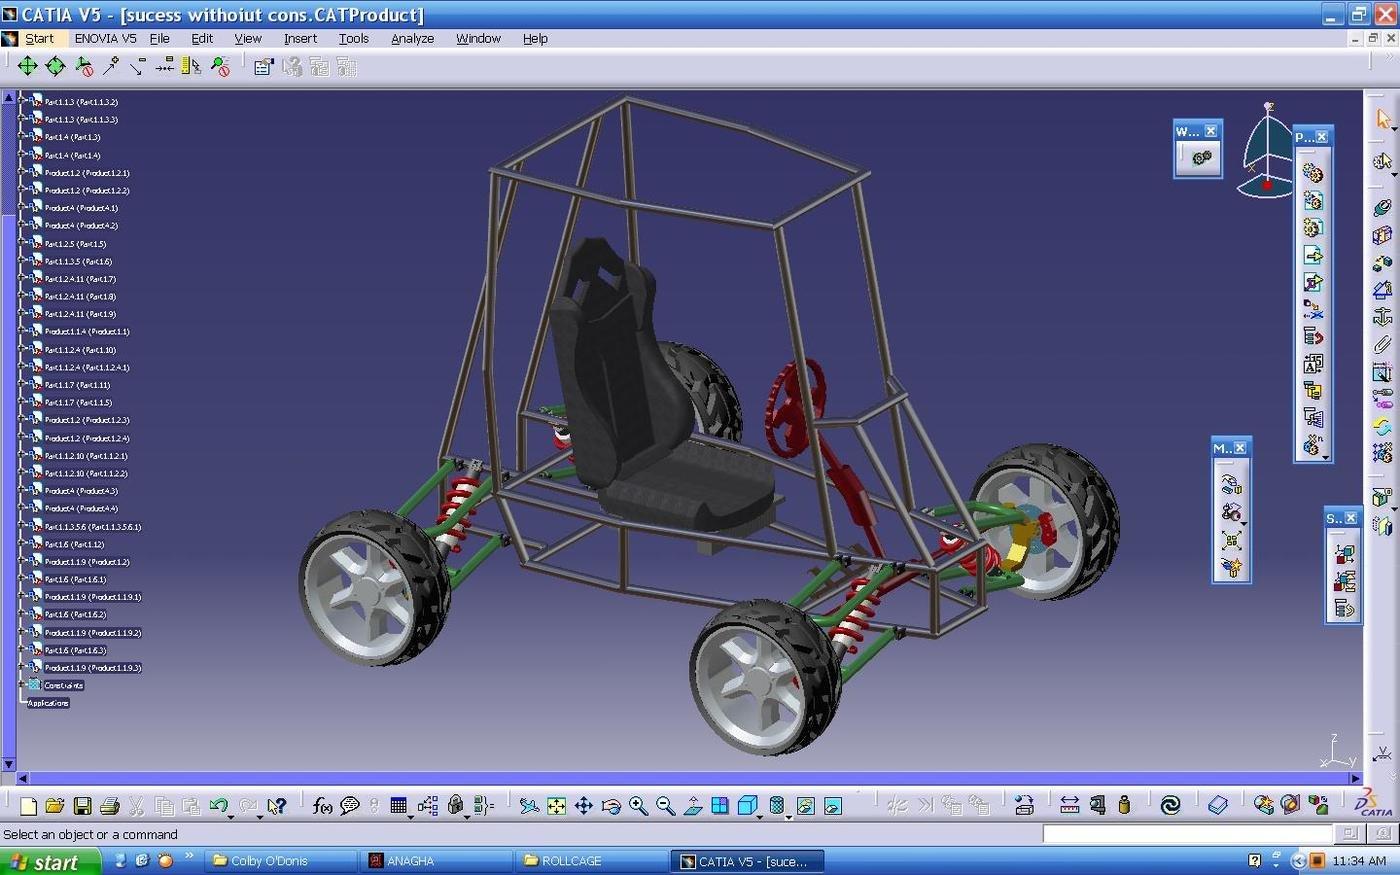 Sae Baja Vehicle Catia V5 Design By Gokula Krishnan At